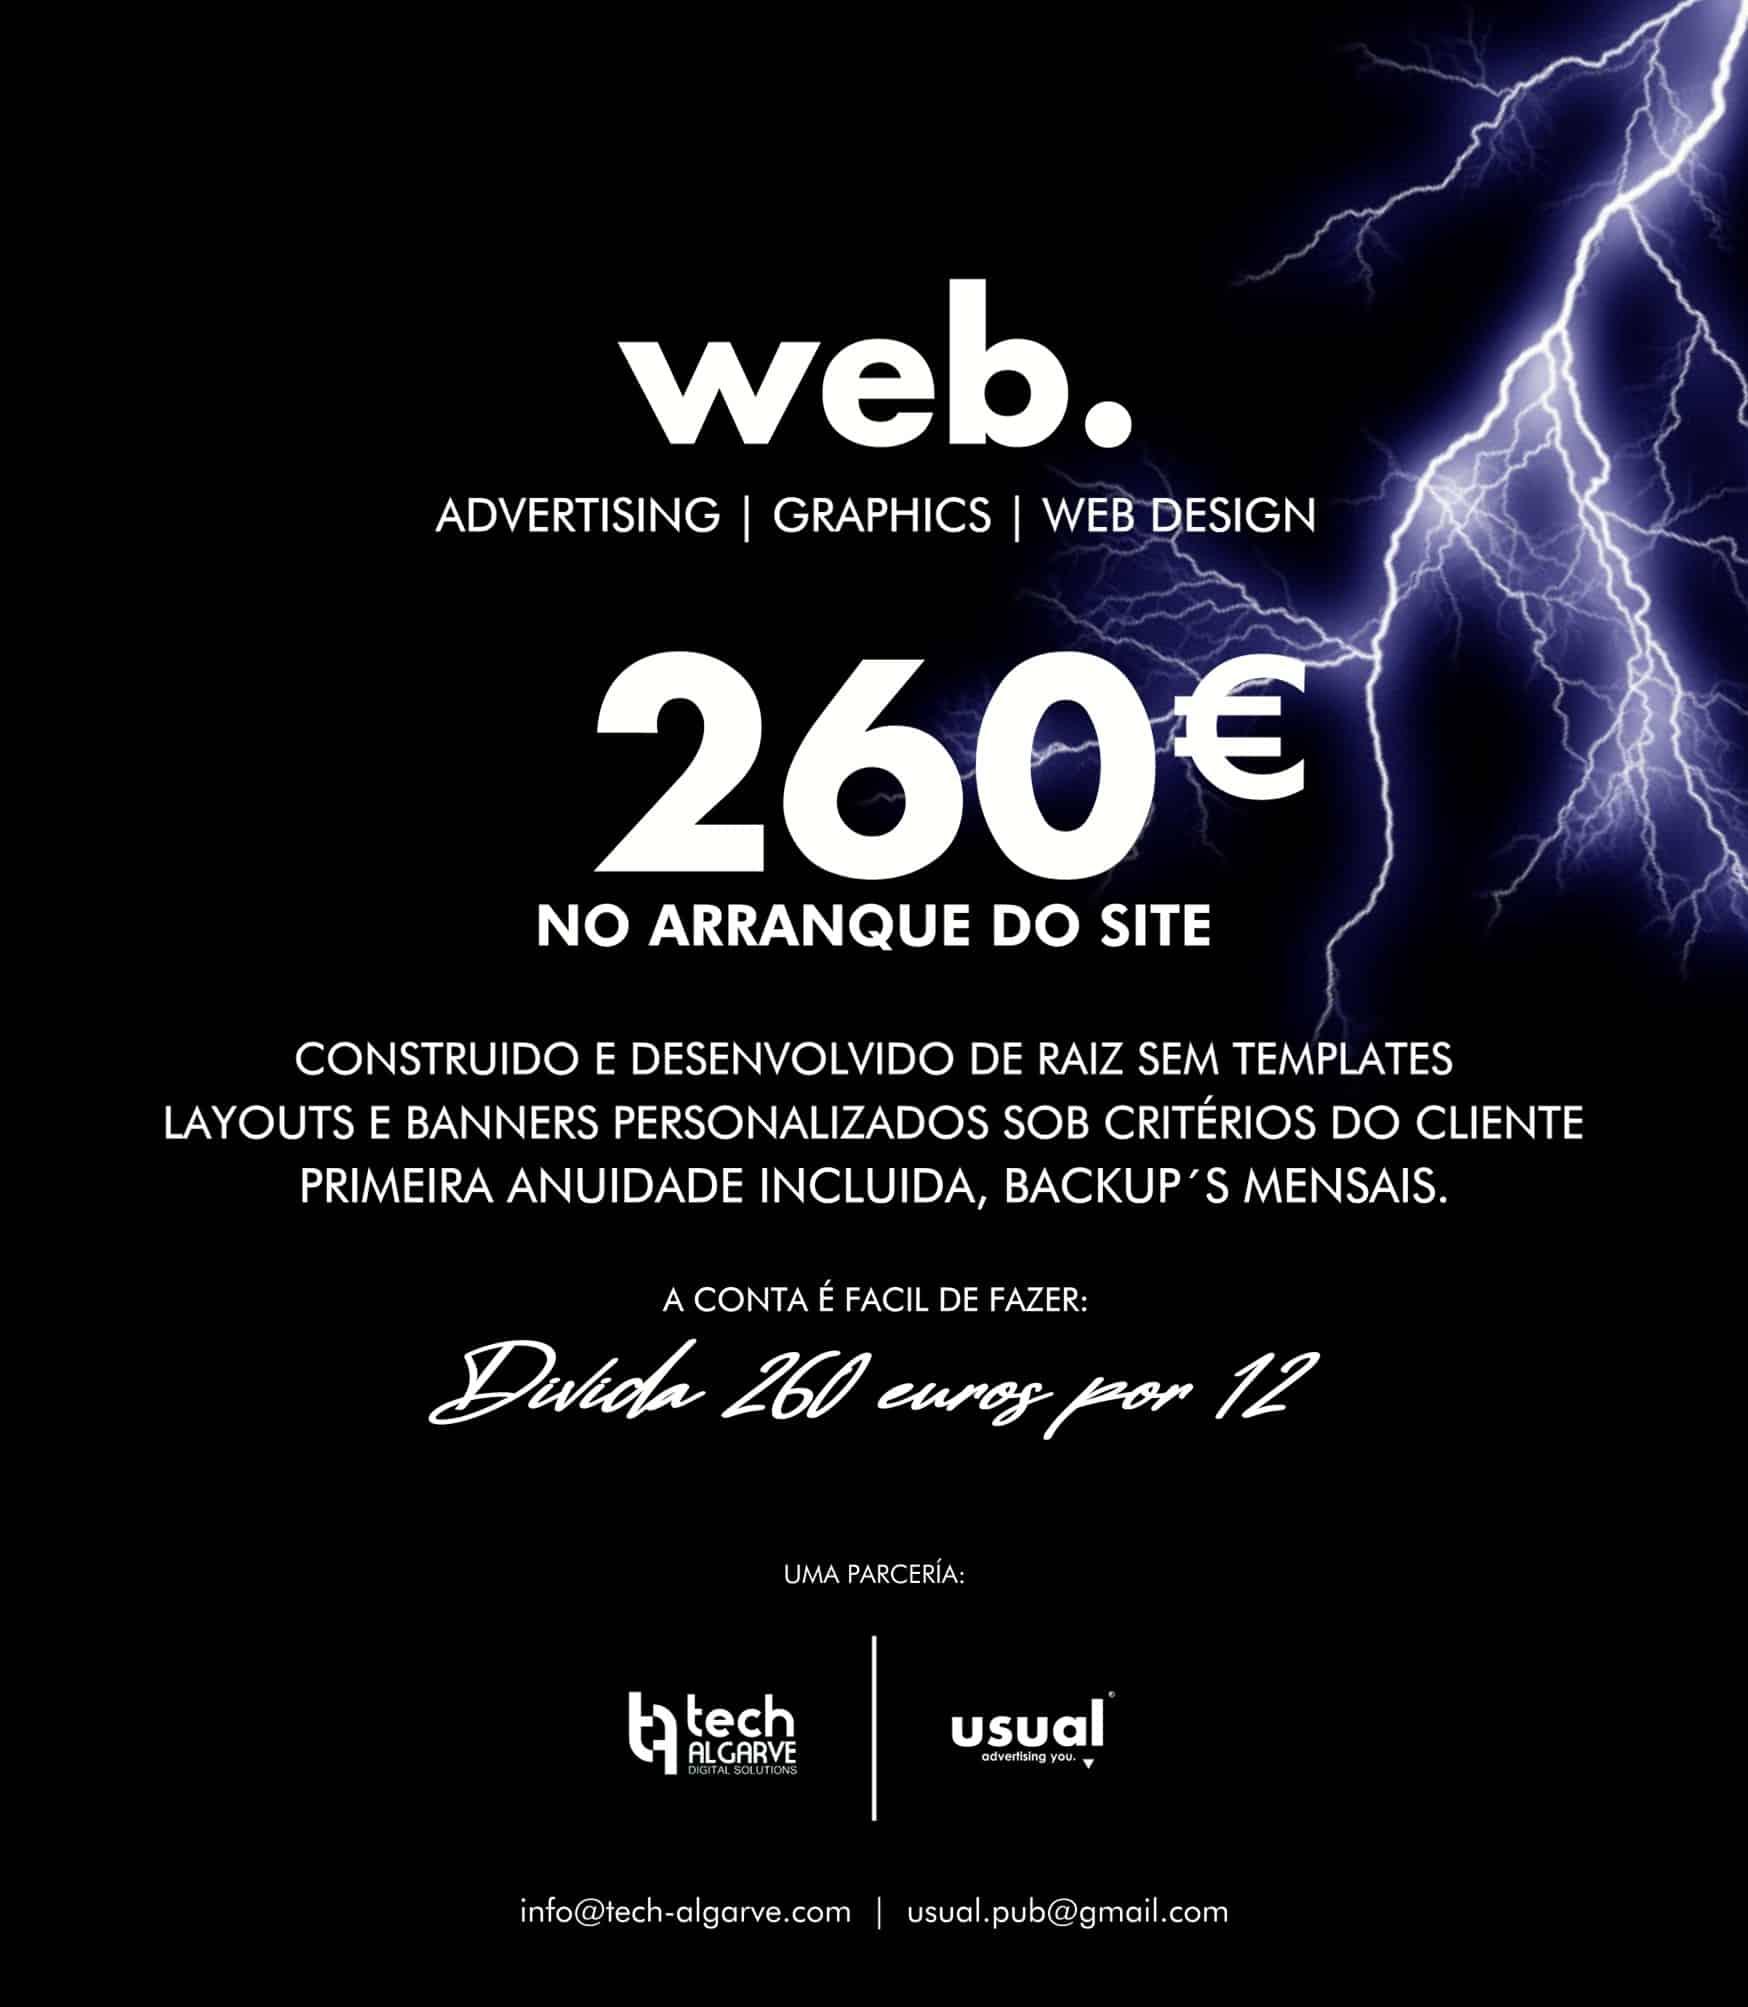 TECH-ALGARVE-WEB-2.jpg